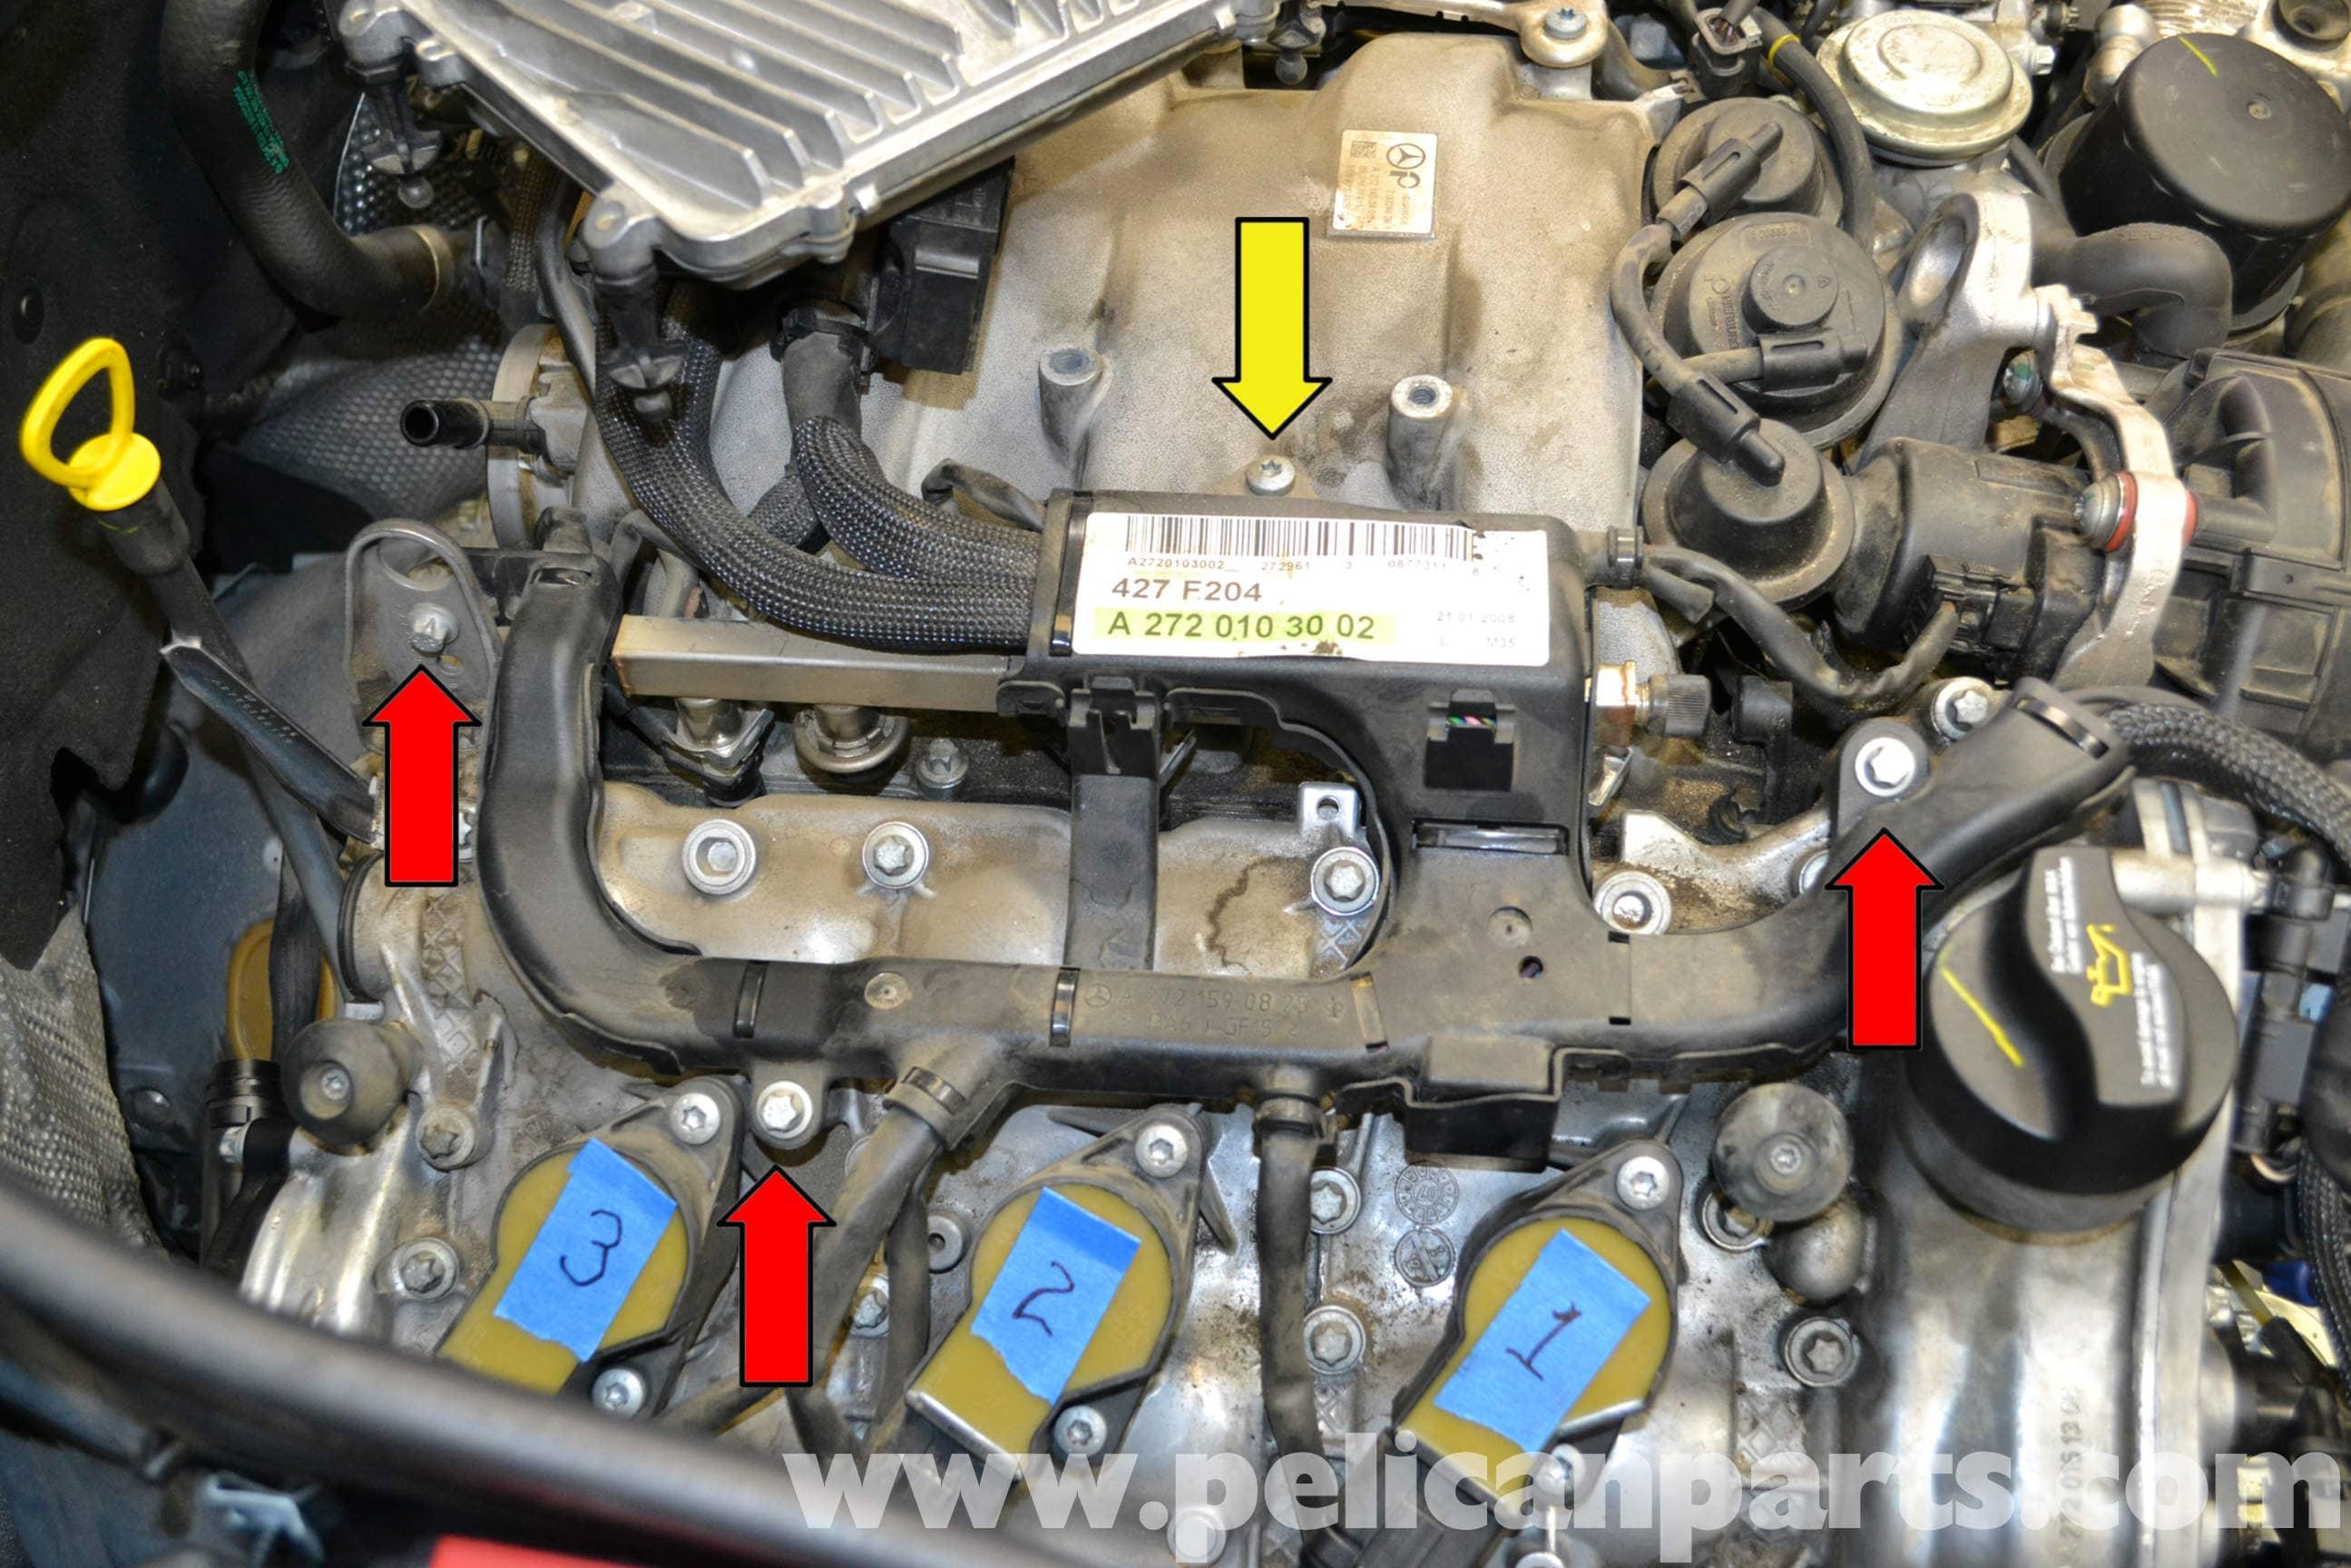 Mercedes-Benz W204 Intake Manifold Replacement - (2008-2014) C250